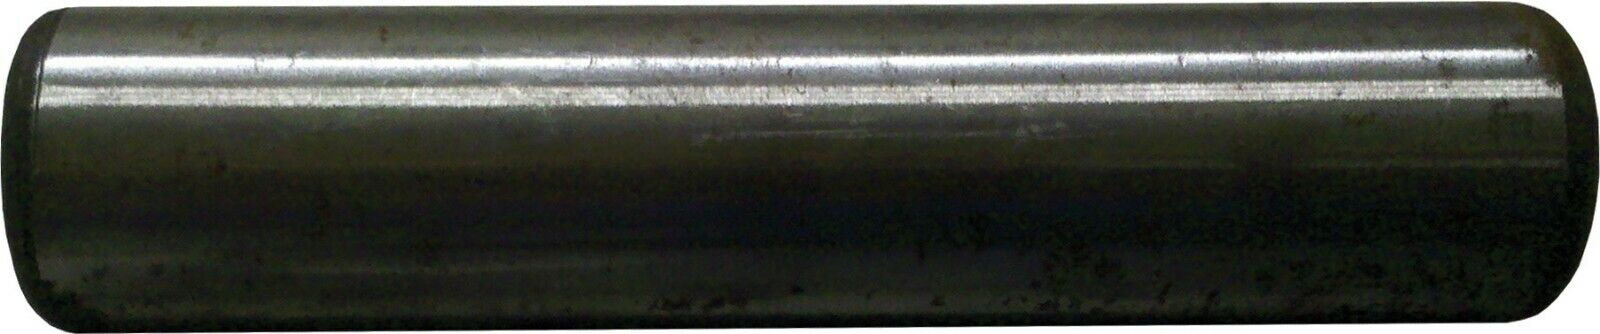 Star EV Classic 2,4,6 (+2) OEM King Pin Pipe 2KP011